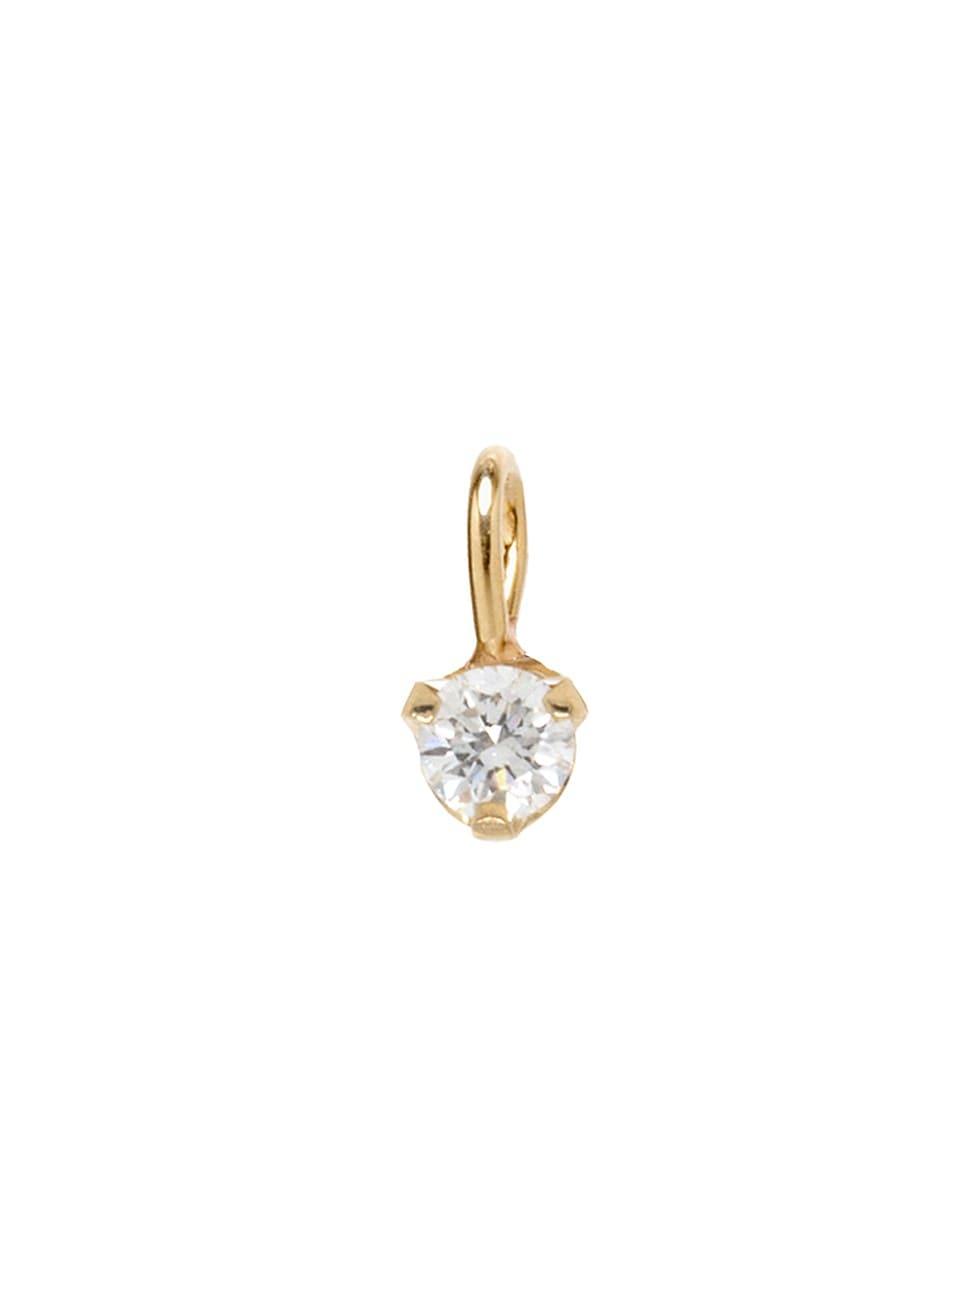 Zoë Chicco Women's 14k Yellow Gold & White Diamond Charm Pendant